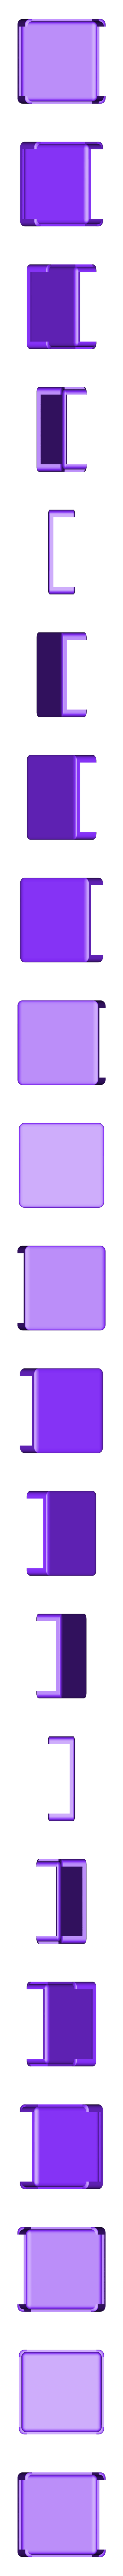 CoasterHolder.stl Download free STL file Customizable Coasters with Holder • 3D printable design, MeesterEduard